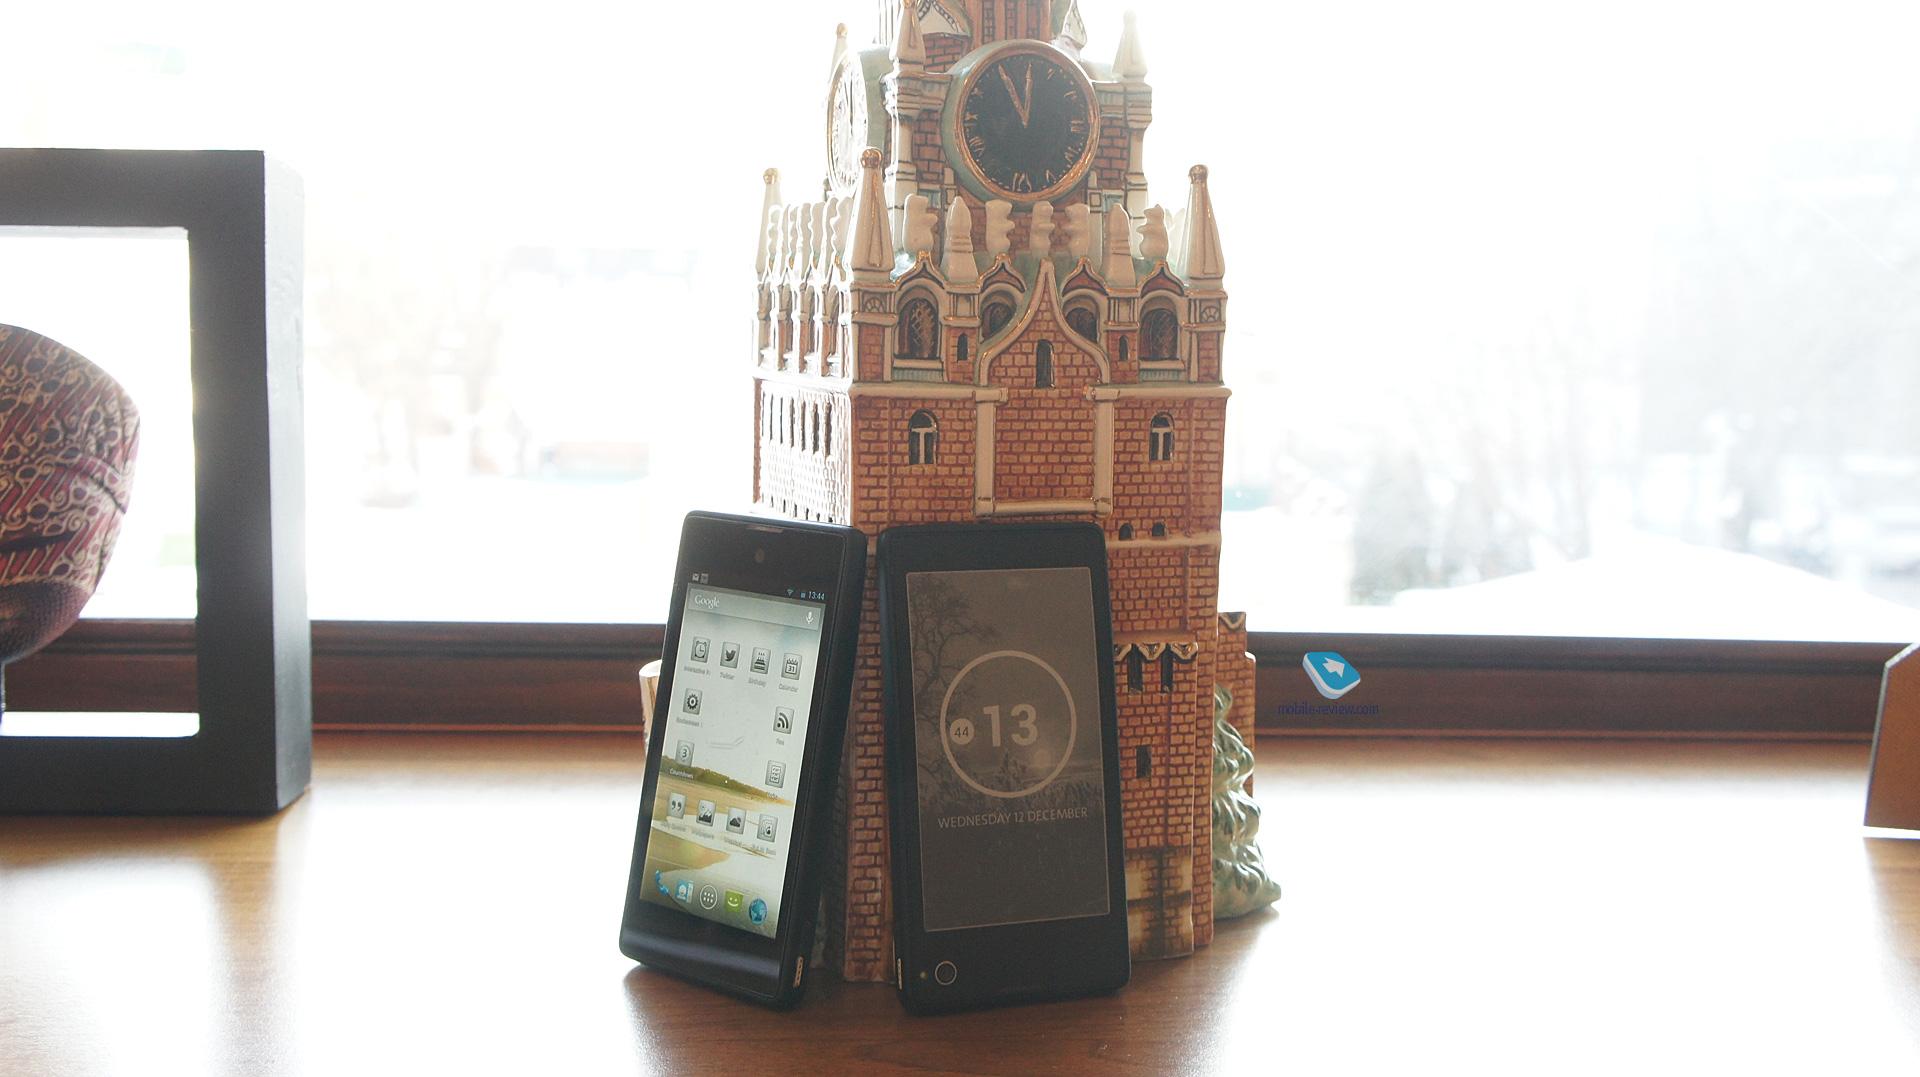 http://mobile-review.com/articles/2012/image/yota-phone/live/high/live4.jpg